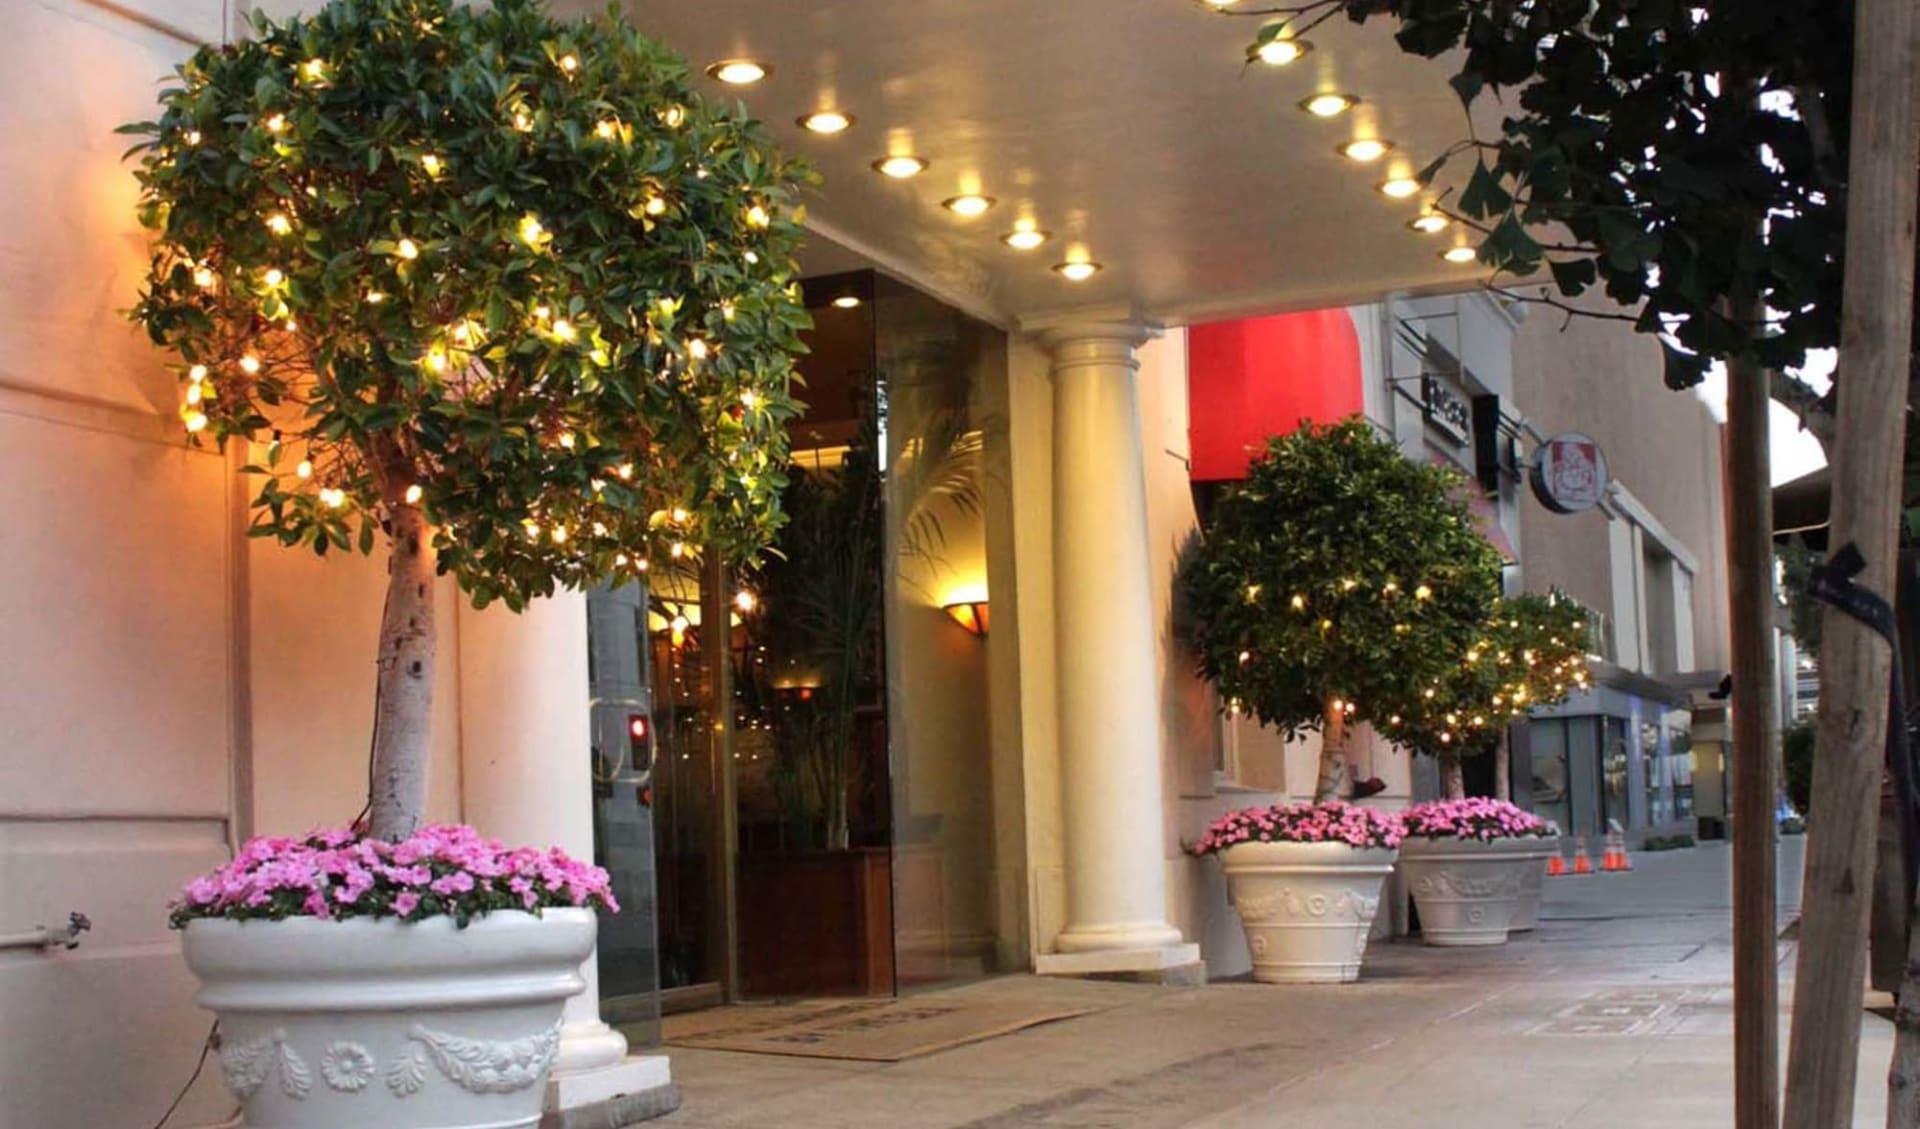 Hotel Carmel by the Sea in Santa Monica:  Carmel by the Sea - Aussenansicht